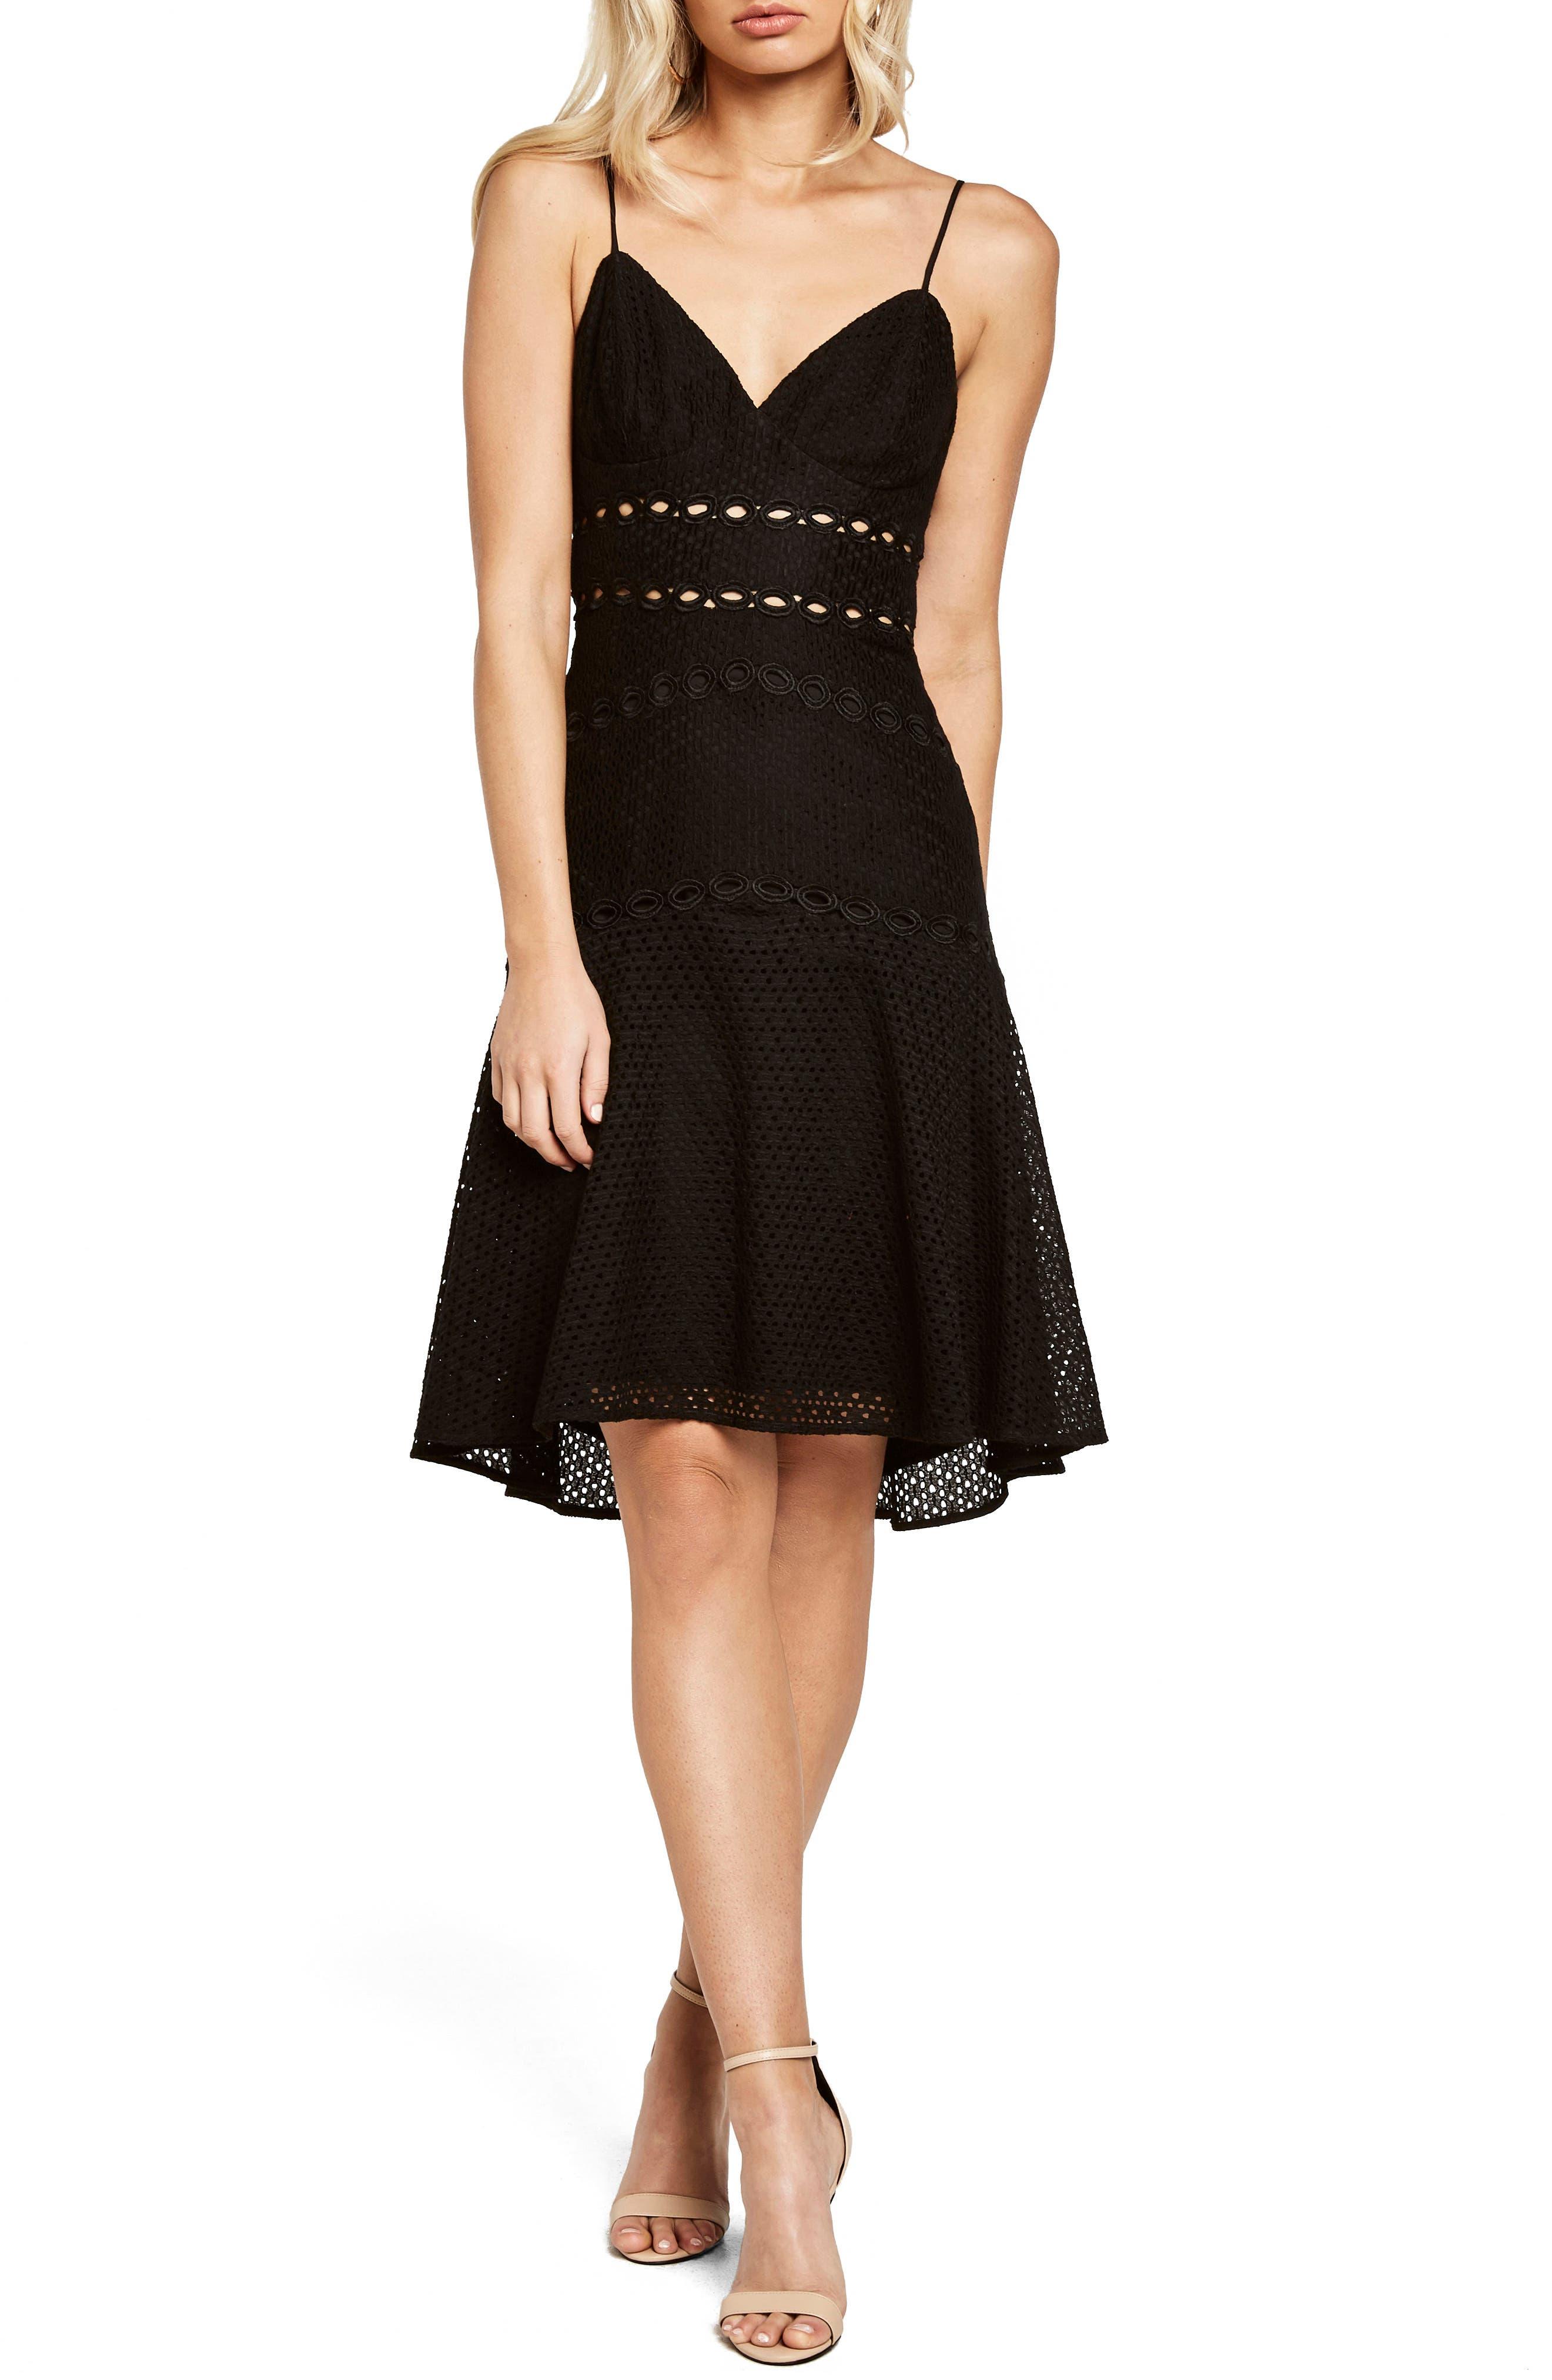 Alternate Image 1 Selected - Bardot Ariana Fit & Flare Dress